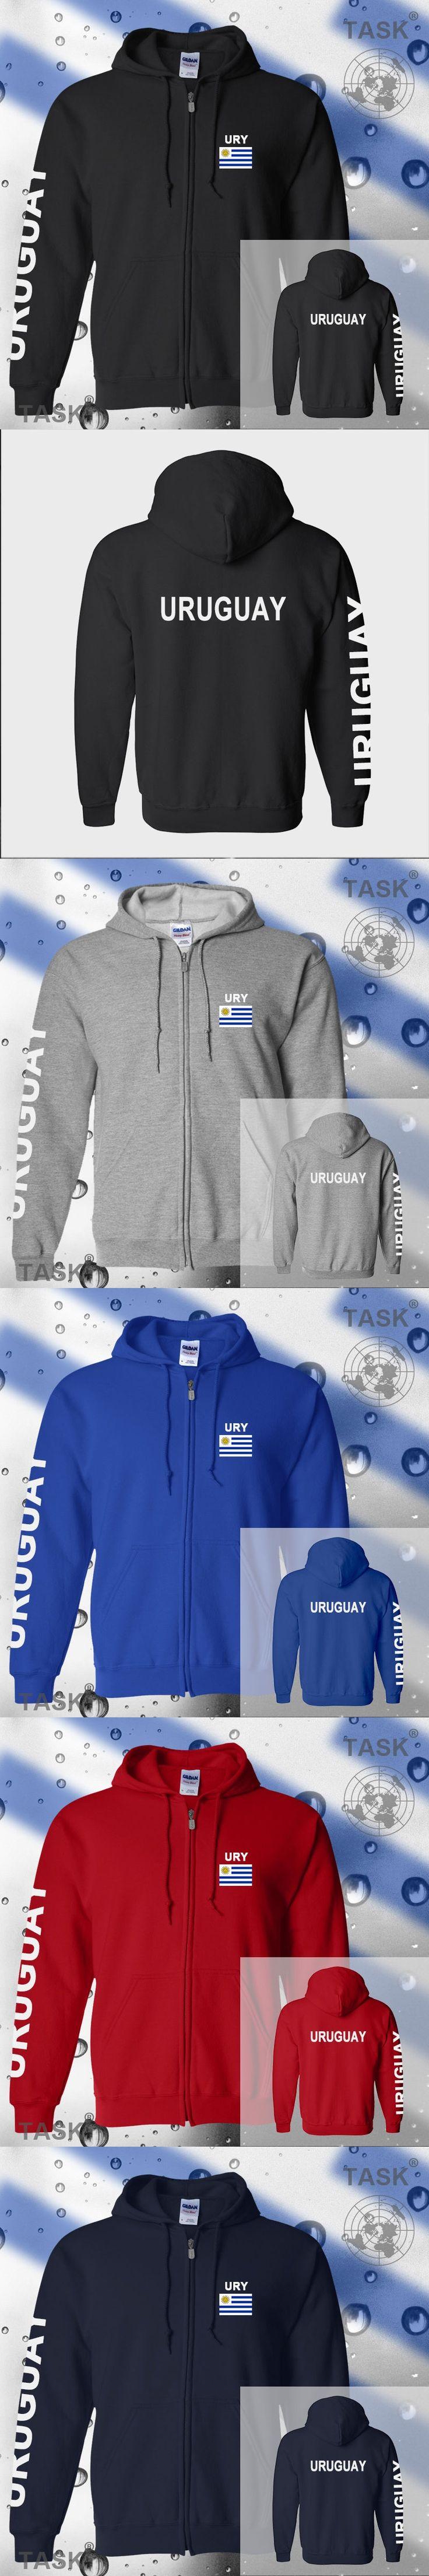 Uruguay Uruguayan mens hoodies and sweatshirt casual polo sweat new streetwear tracksuit nations fleece zipper flag 2017 URY UY